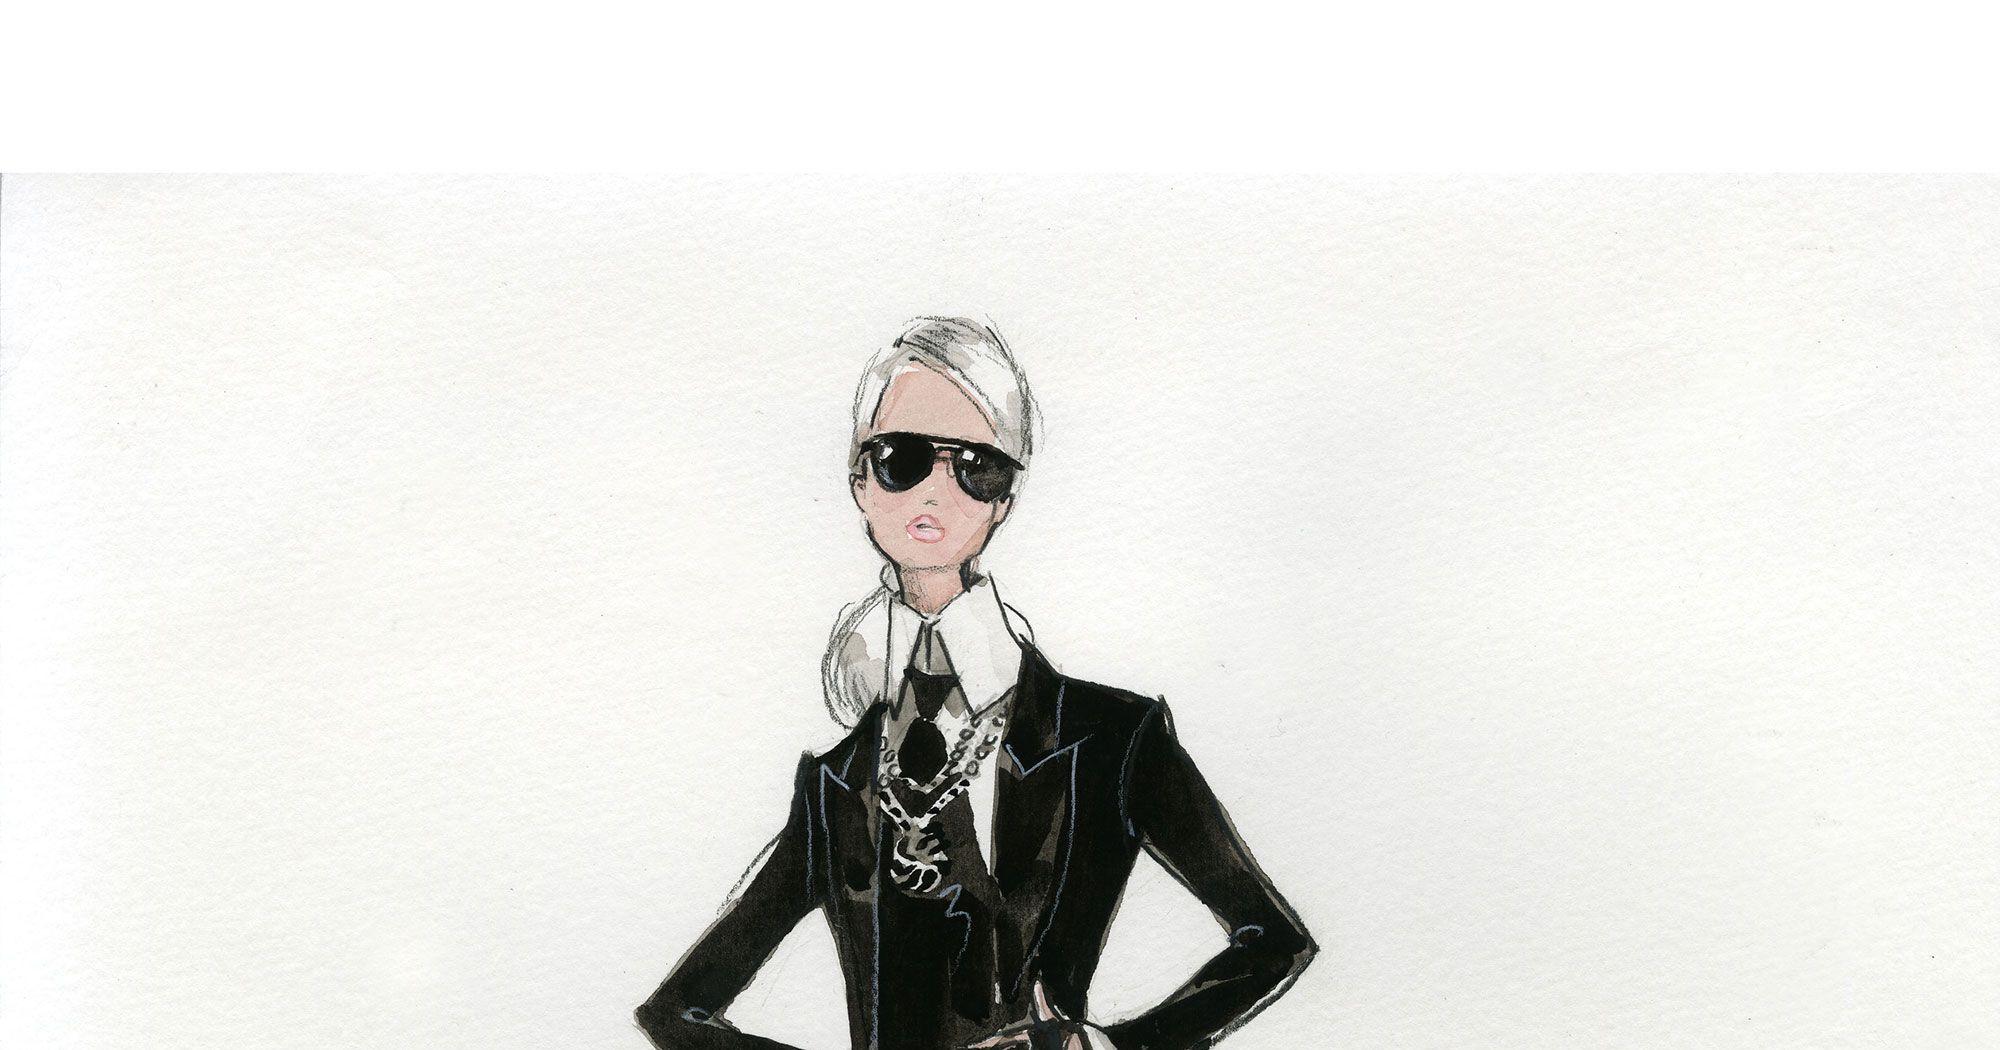 Mattel Is Making a Karl Lagerfeld Barbie -- The Cut